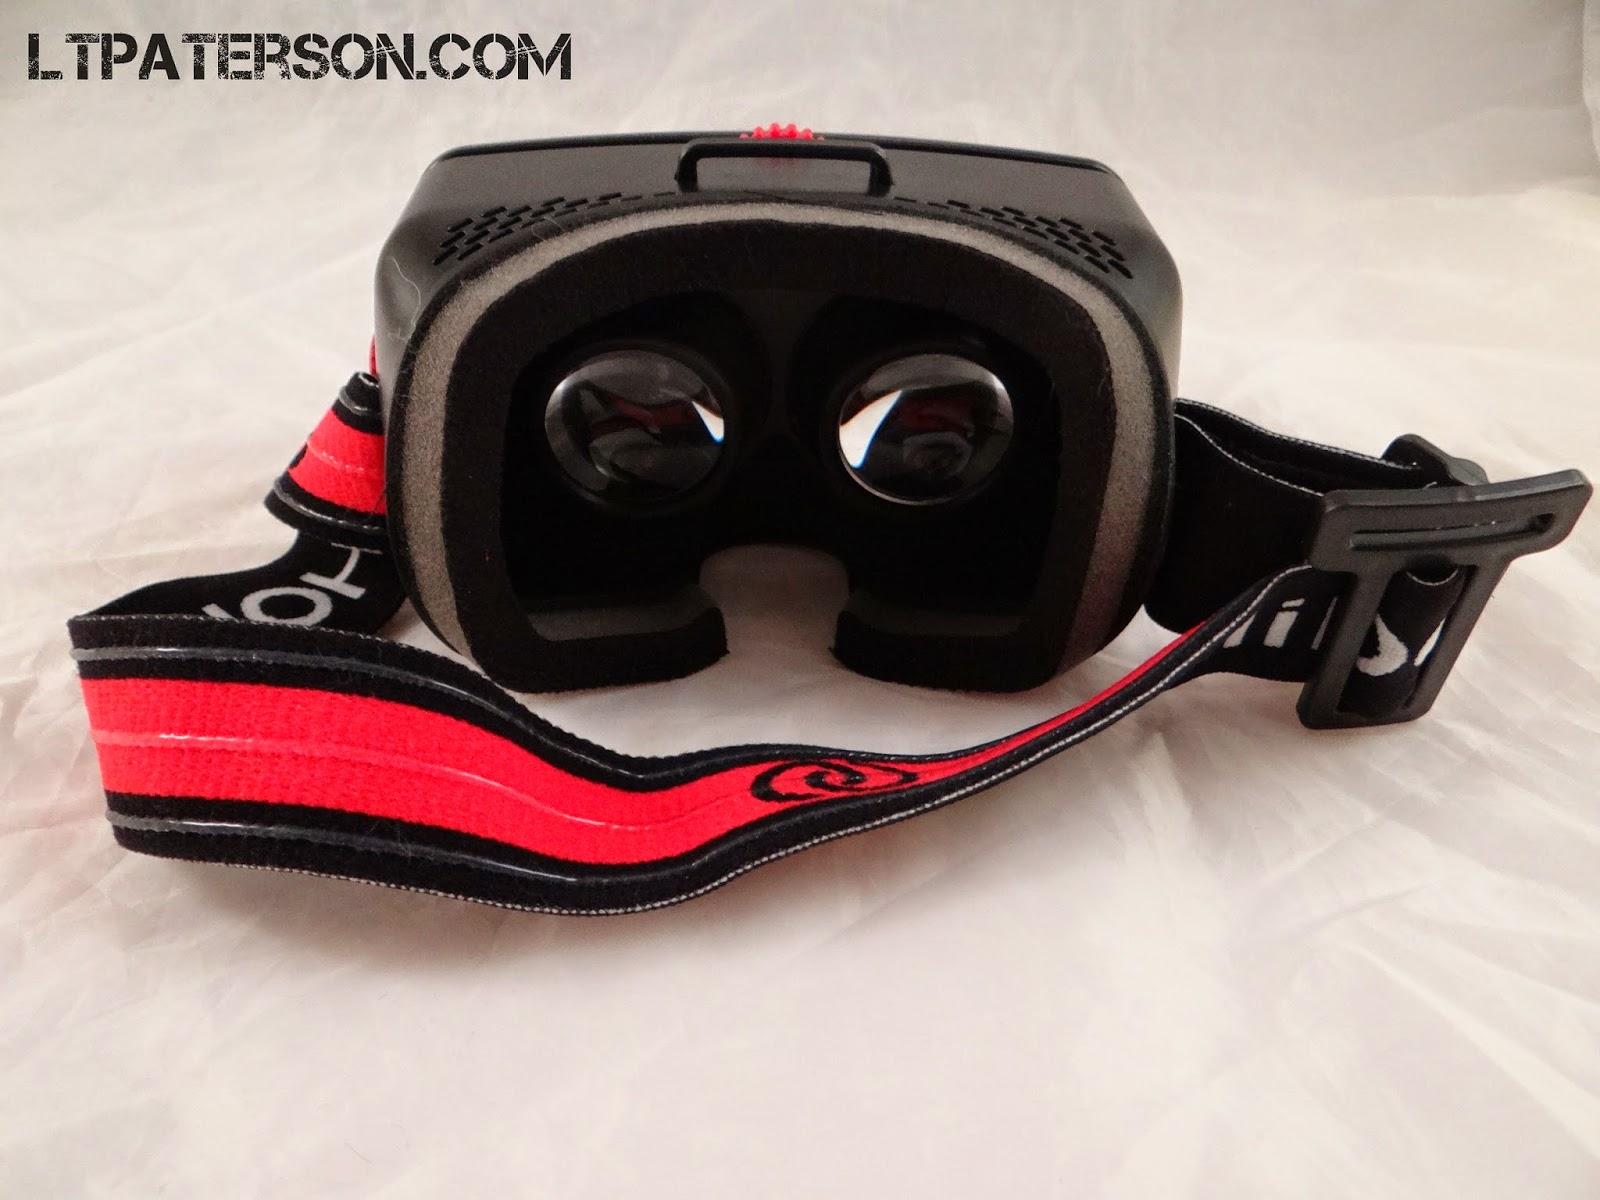 test du casque virtuel homido blog jeux video pc high tech cinema. Black Bedroom Furniture Sets. Home Design Ideas